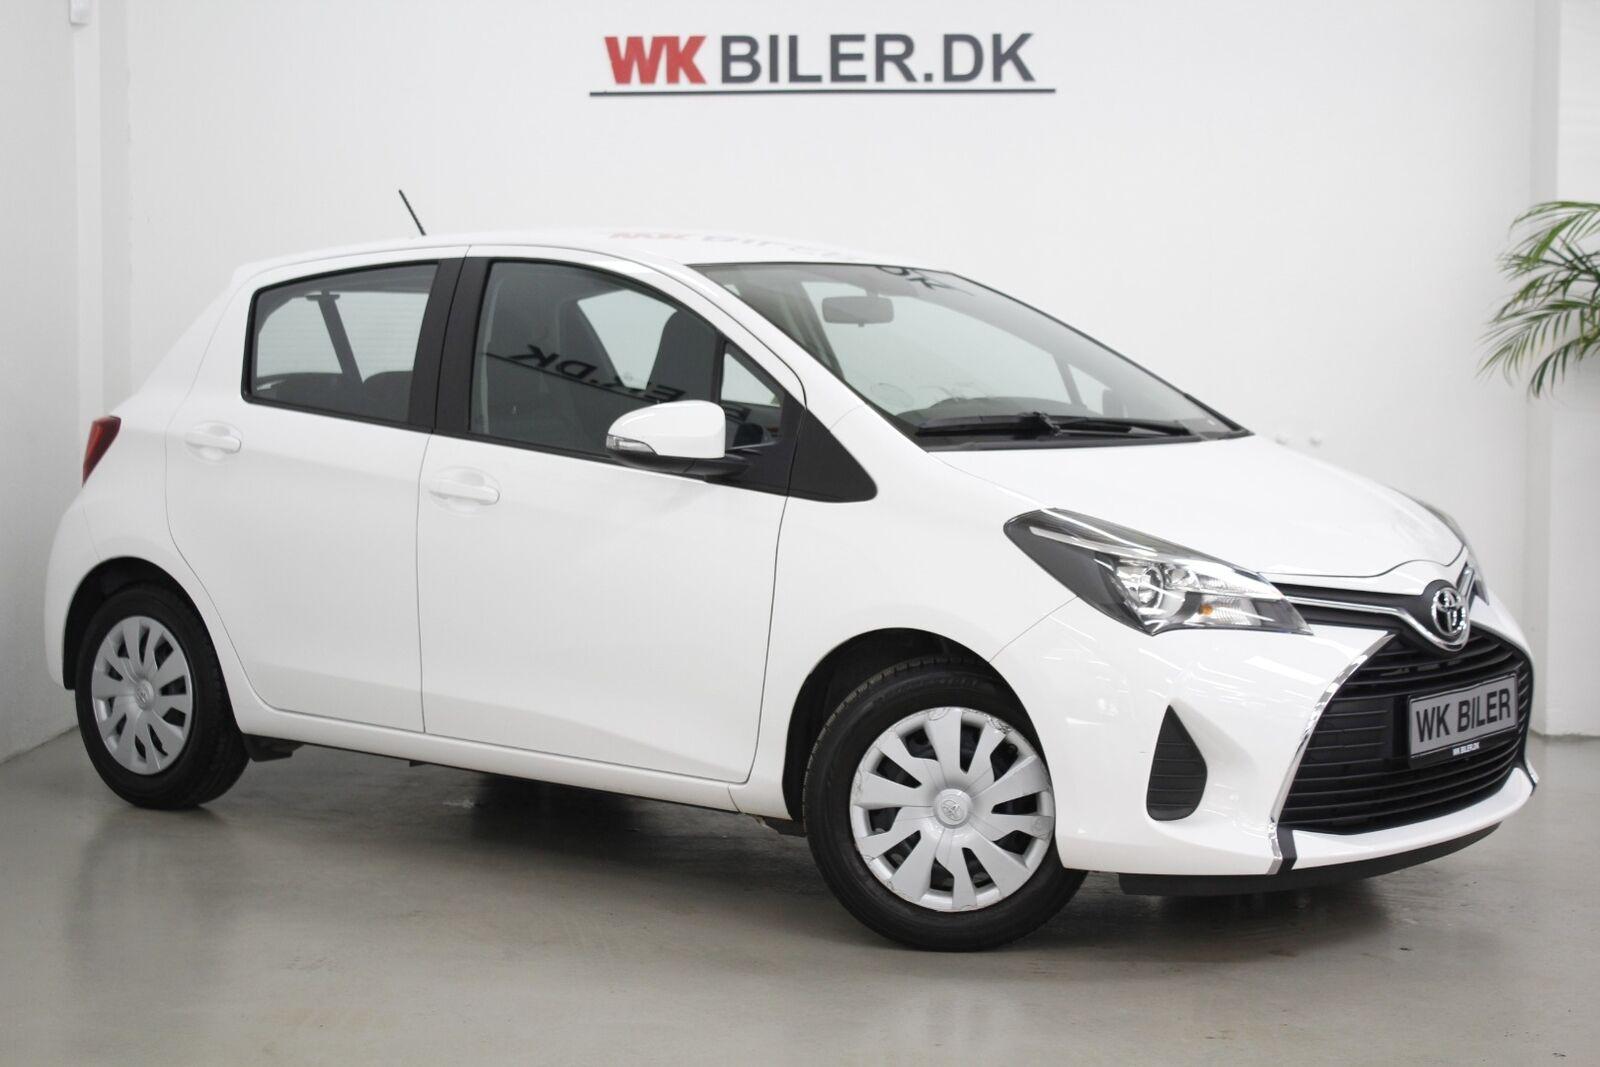 Toyota Yaris 1,0 VVT-i T2 5d - 79.800 kr.